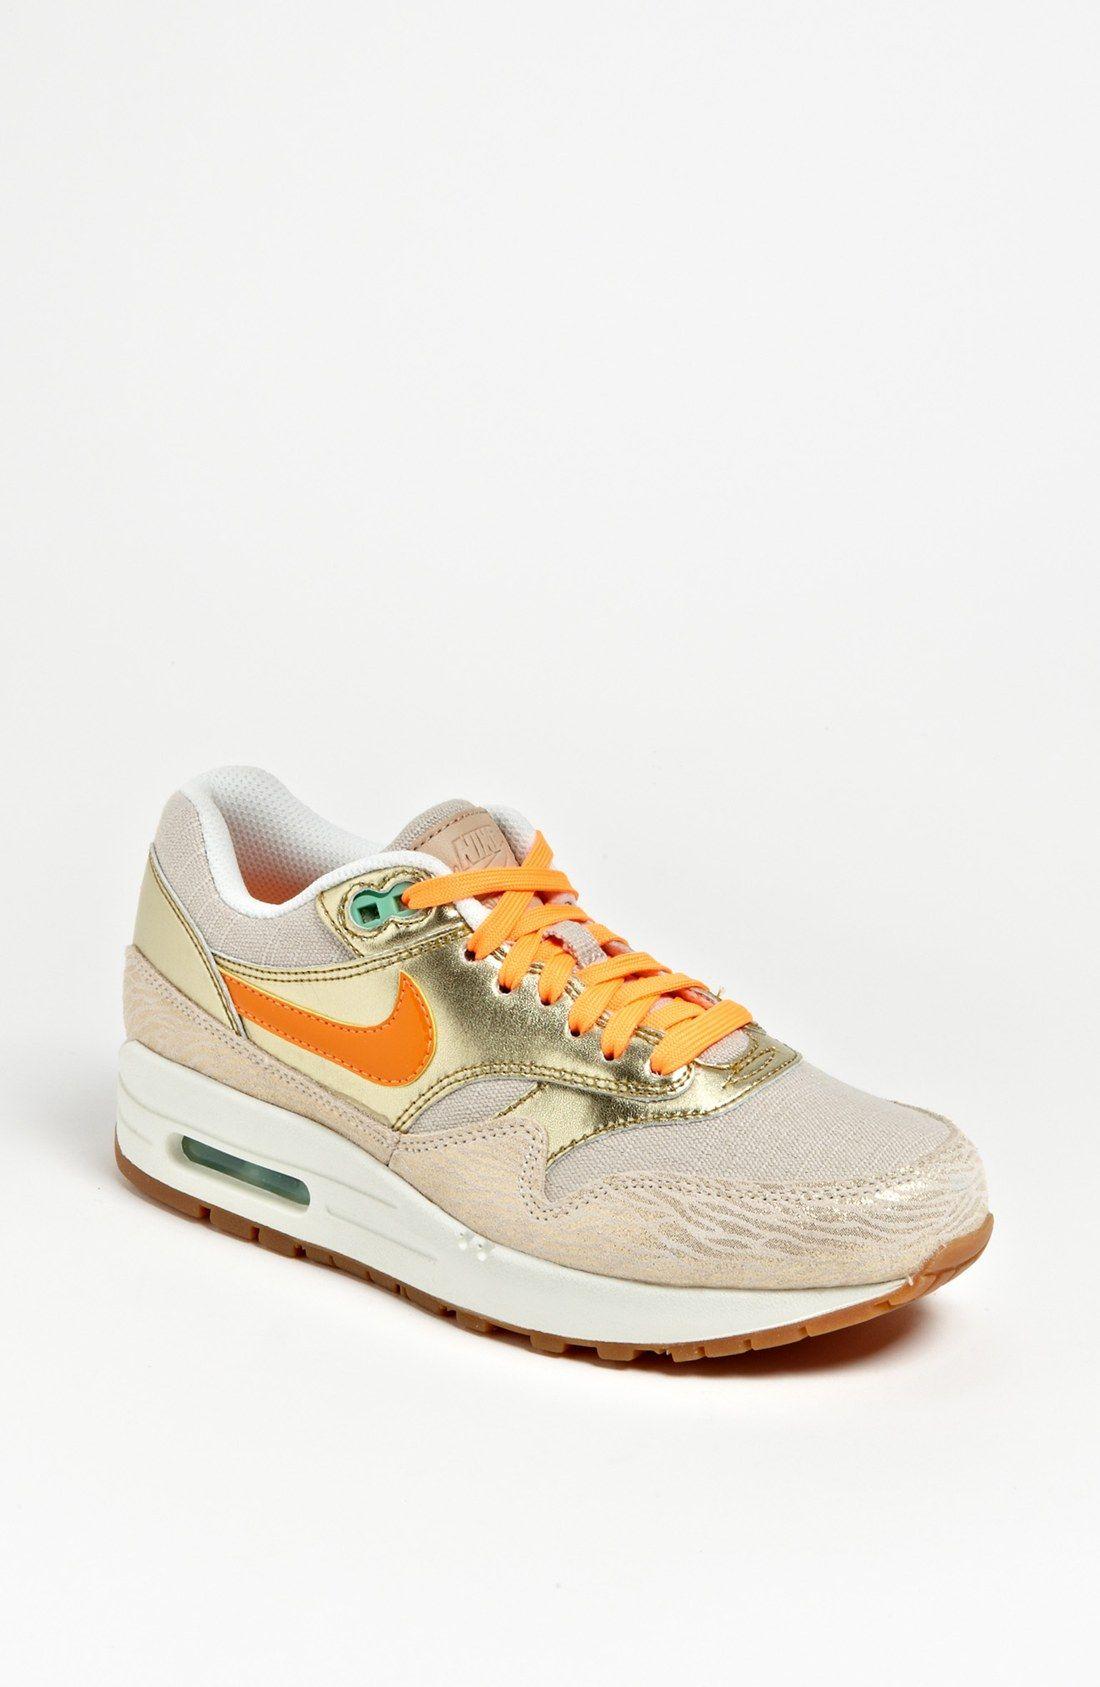 6e26098baad4 Nike Air Max 1 Vintage Sneakers (Women)